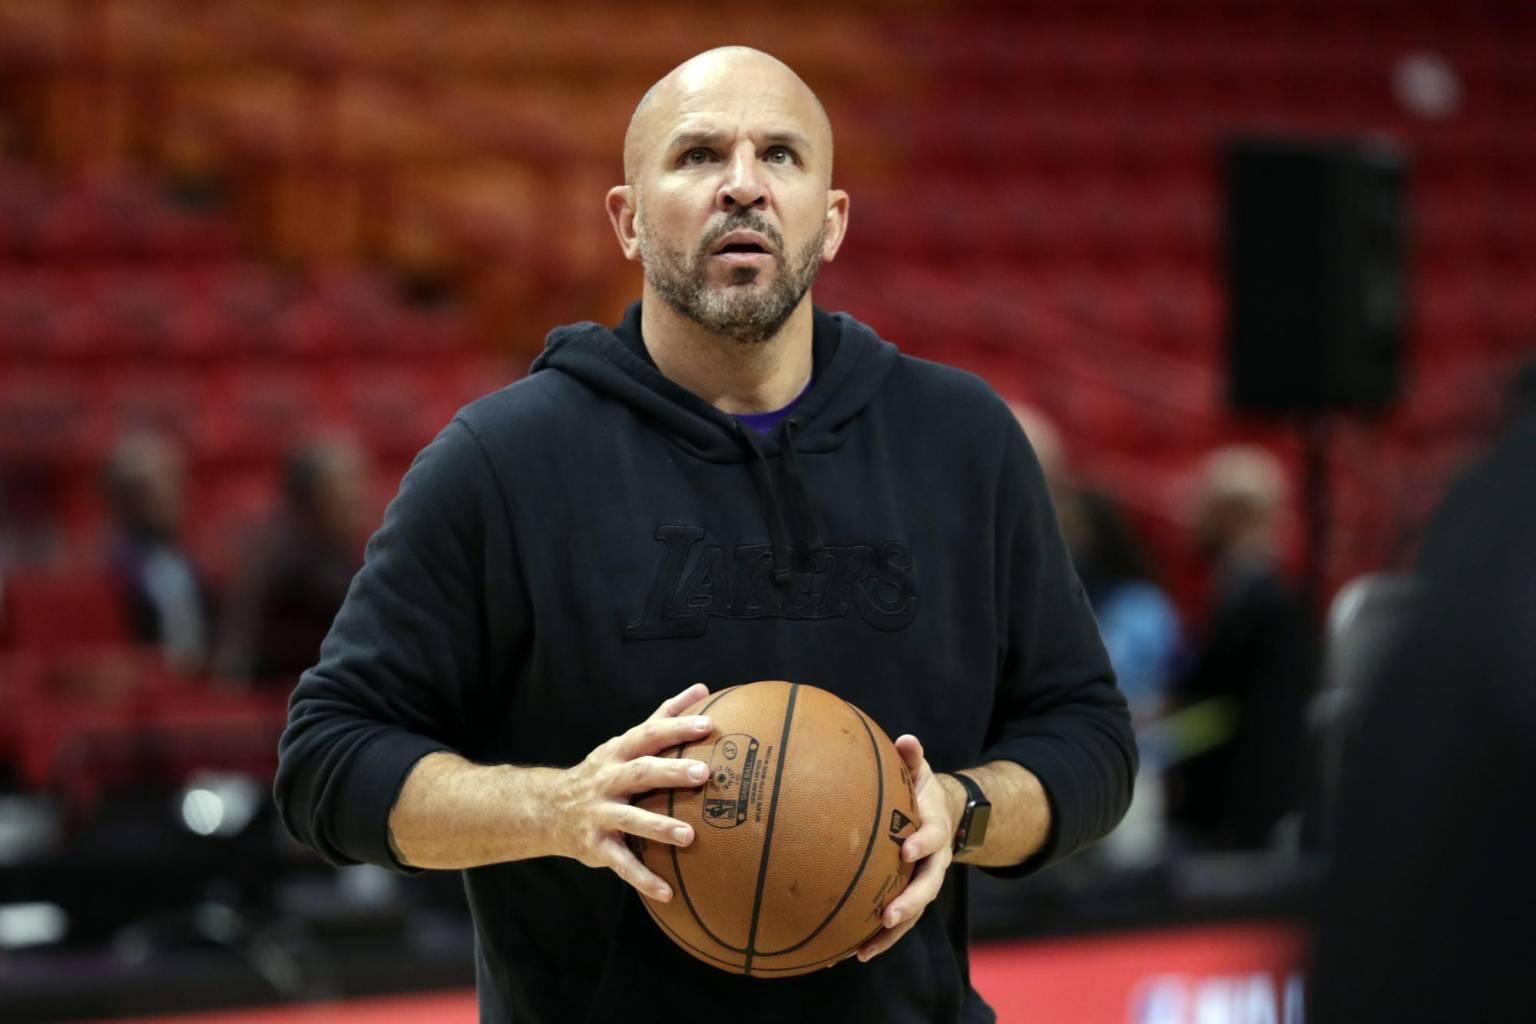 Mavericks llega a un acuerdo con Jason Kidd para su entrenador